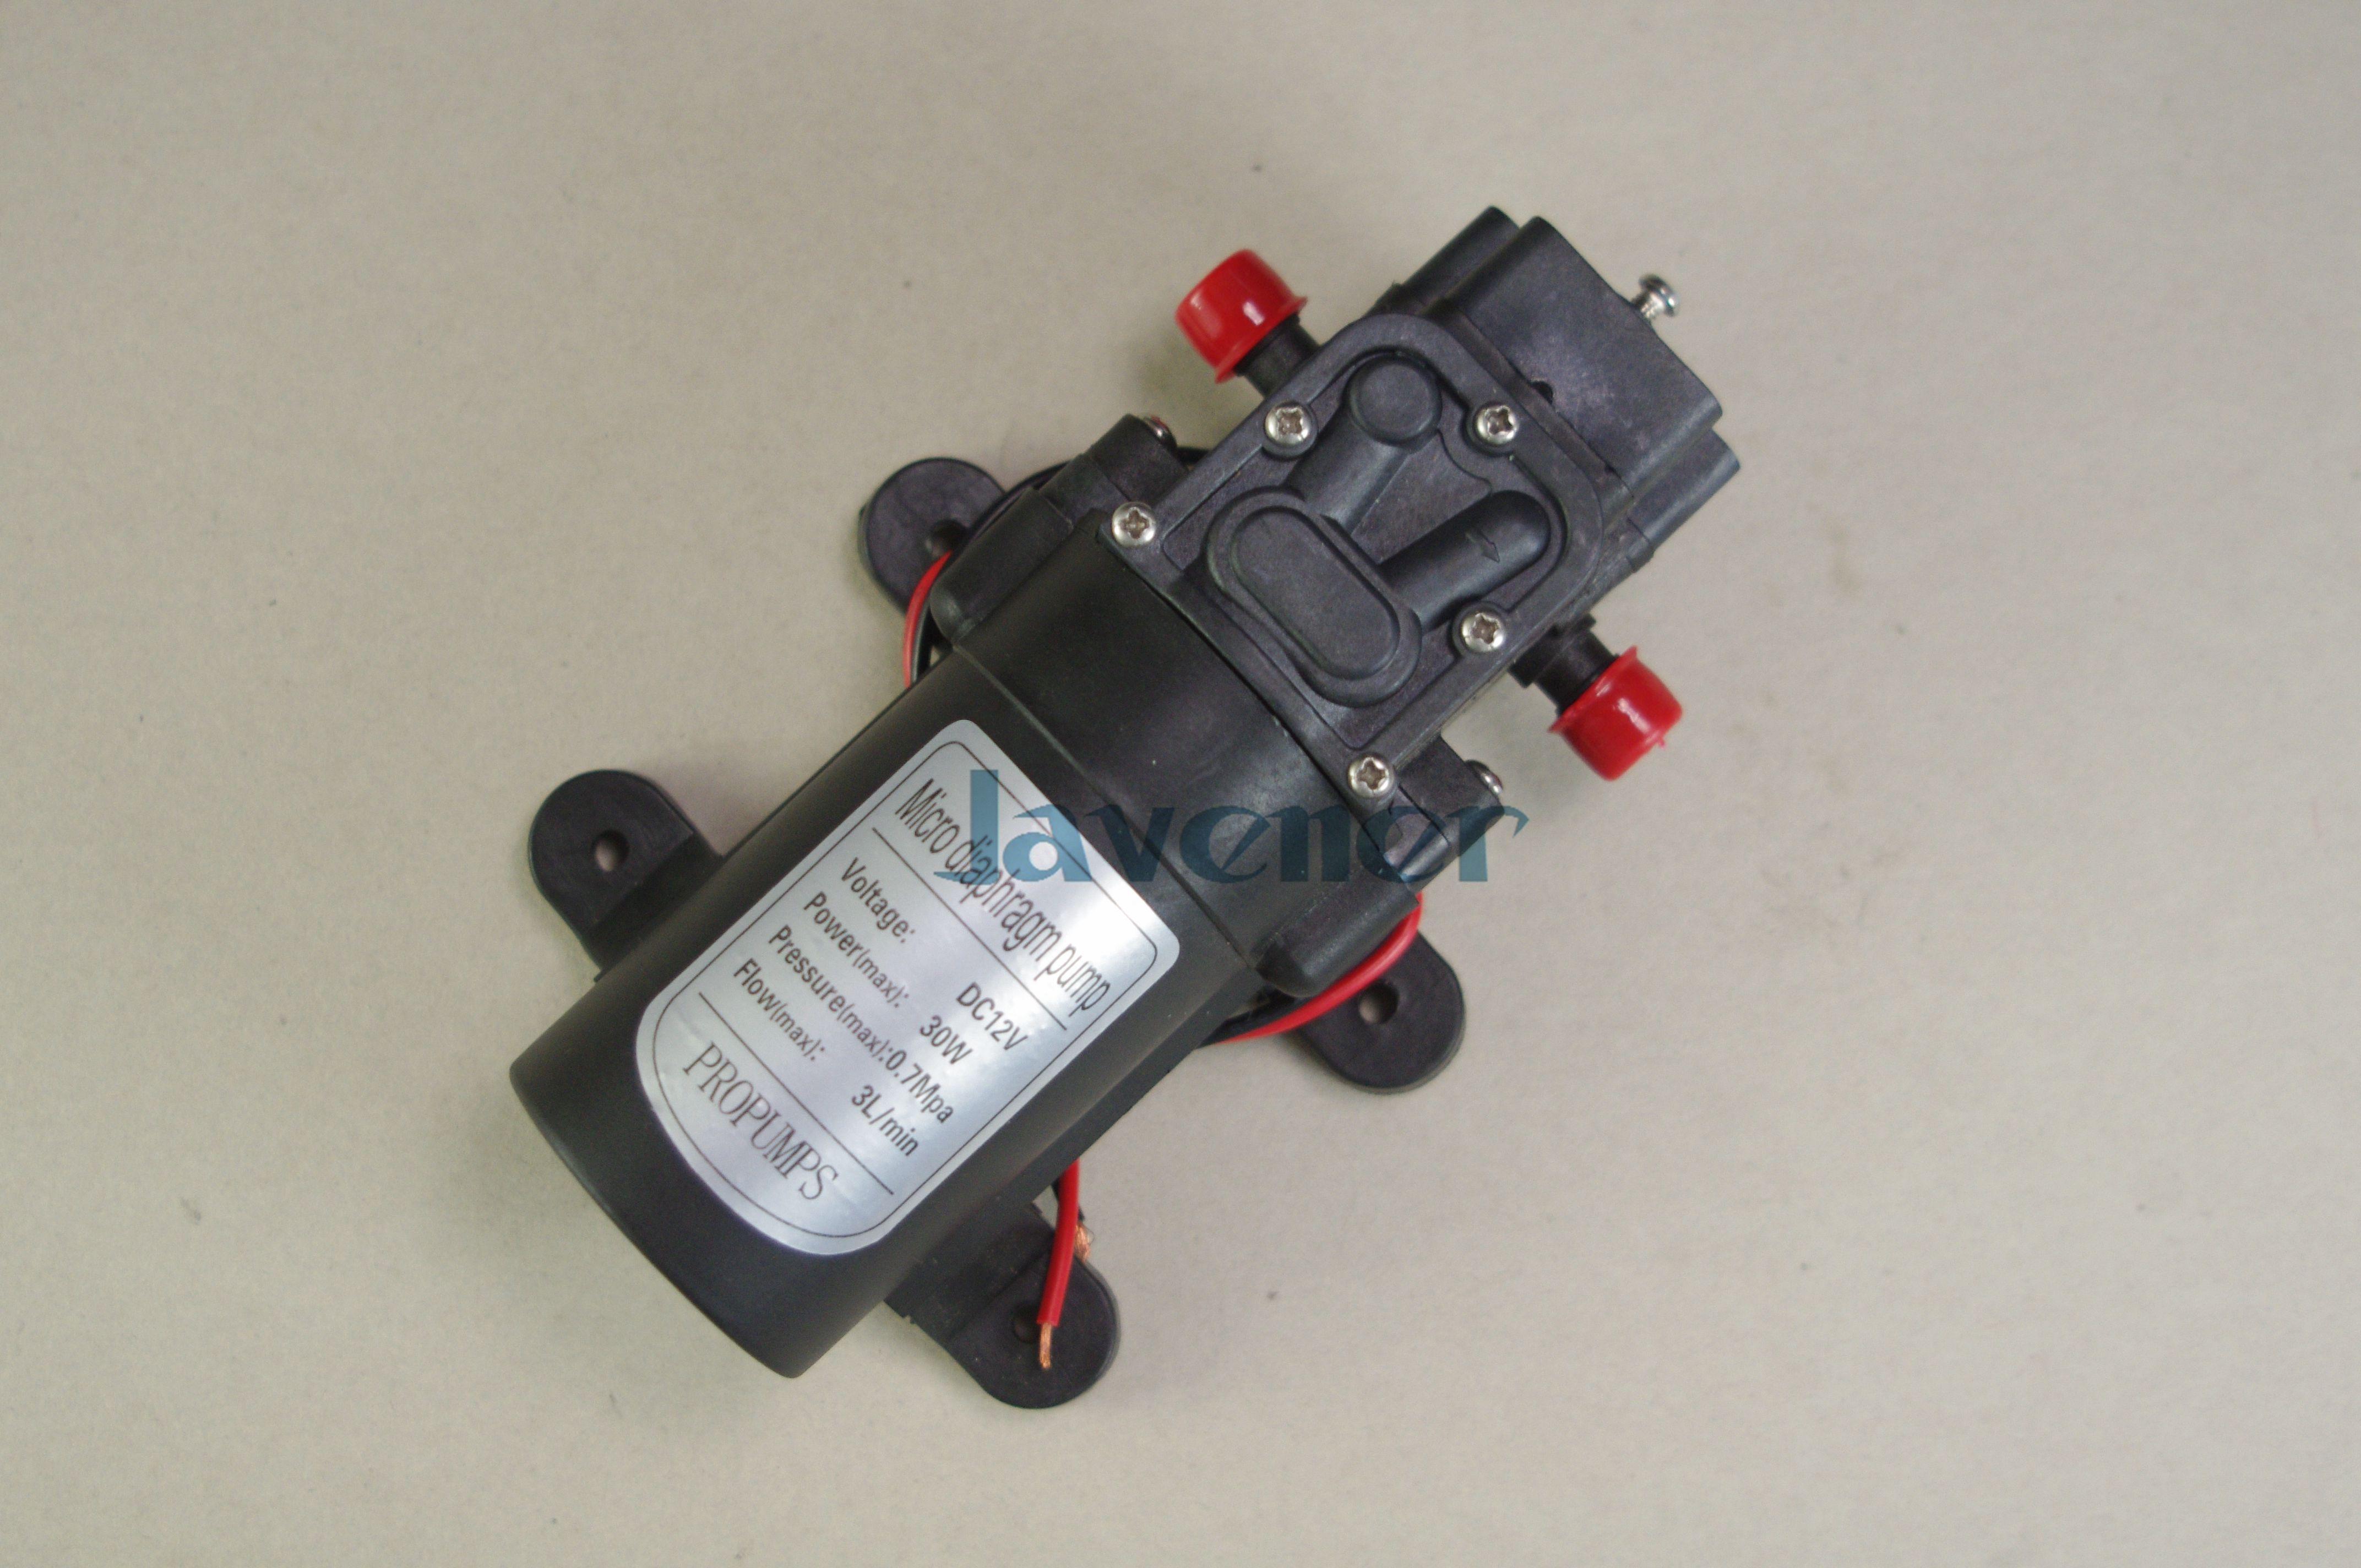 12v Dc Electric Mini Diaphragm Pump Self Priming Booster Pumnp Low